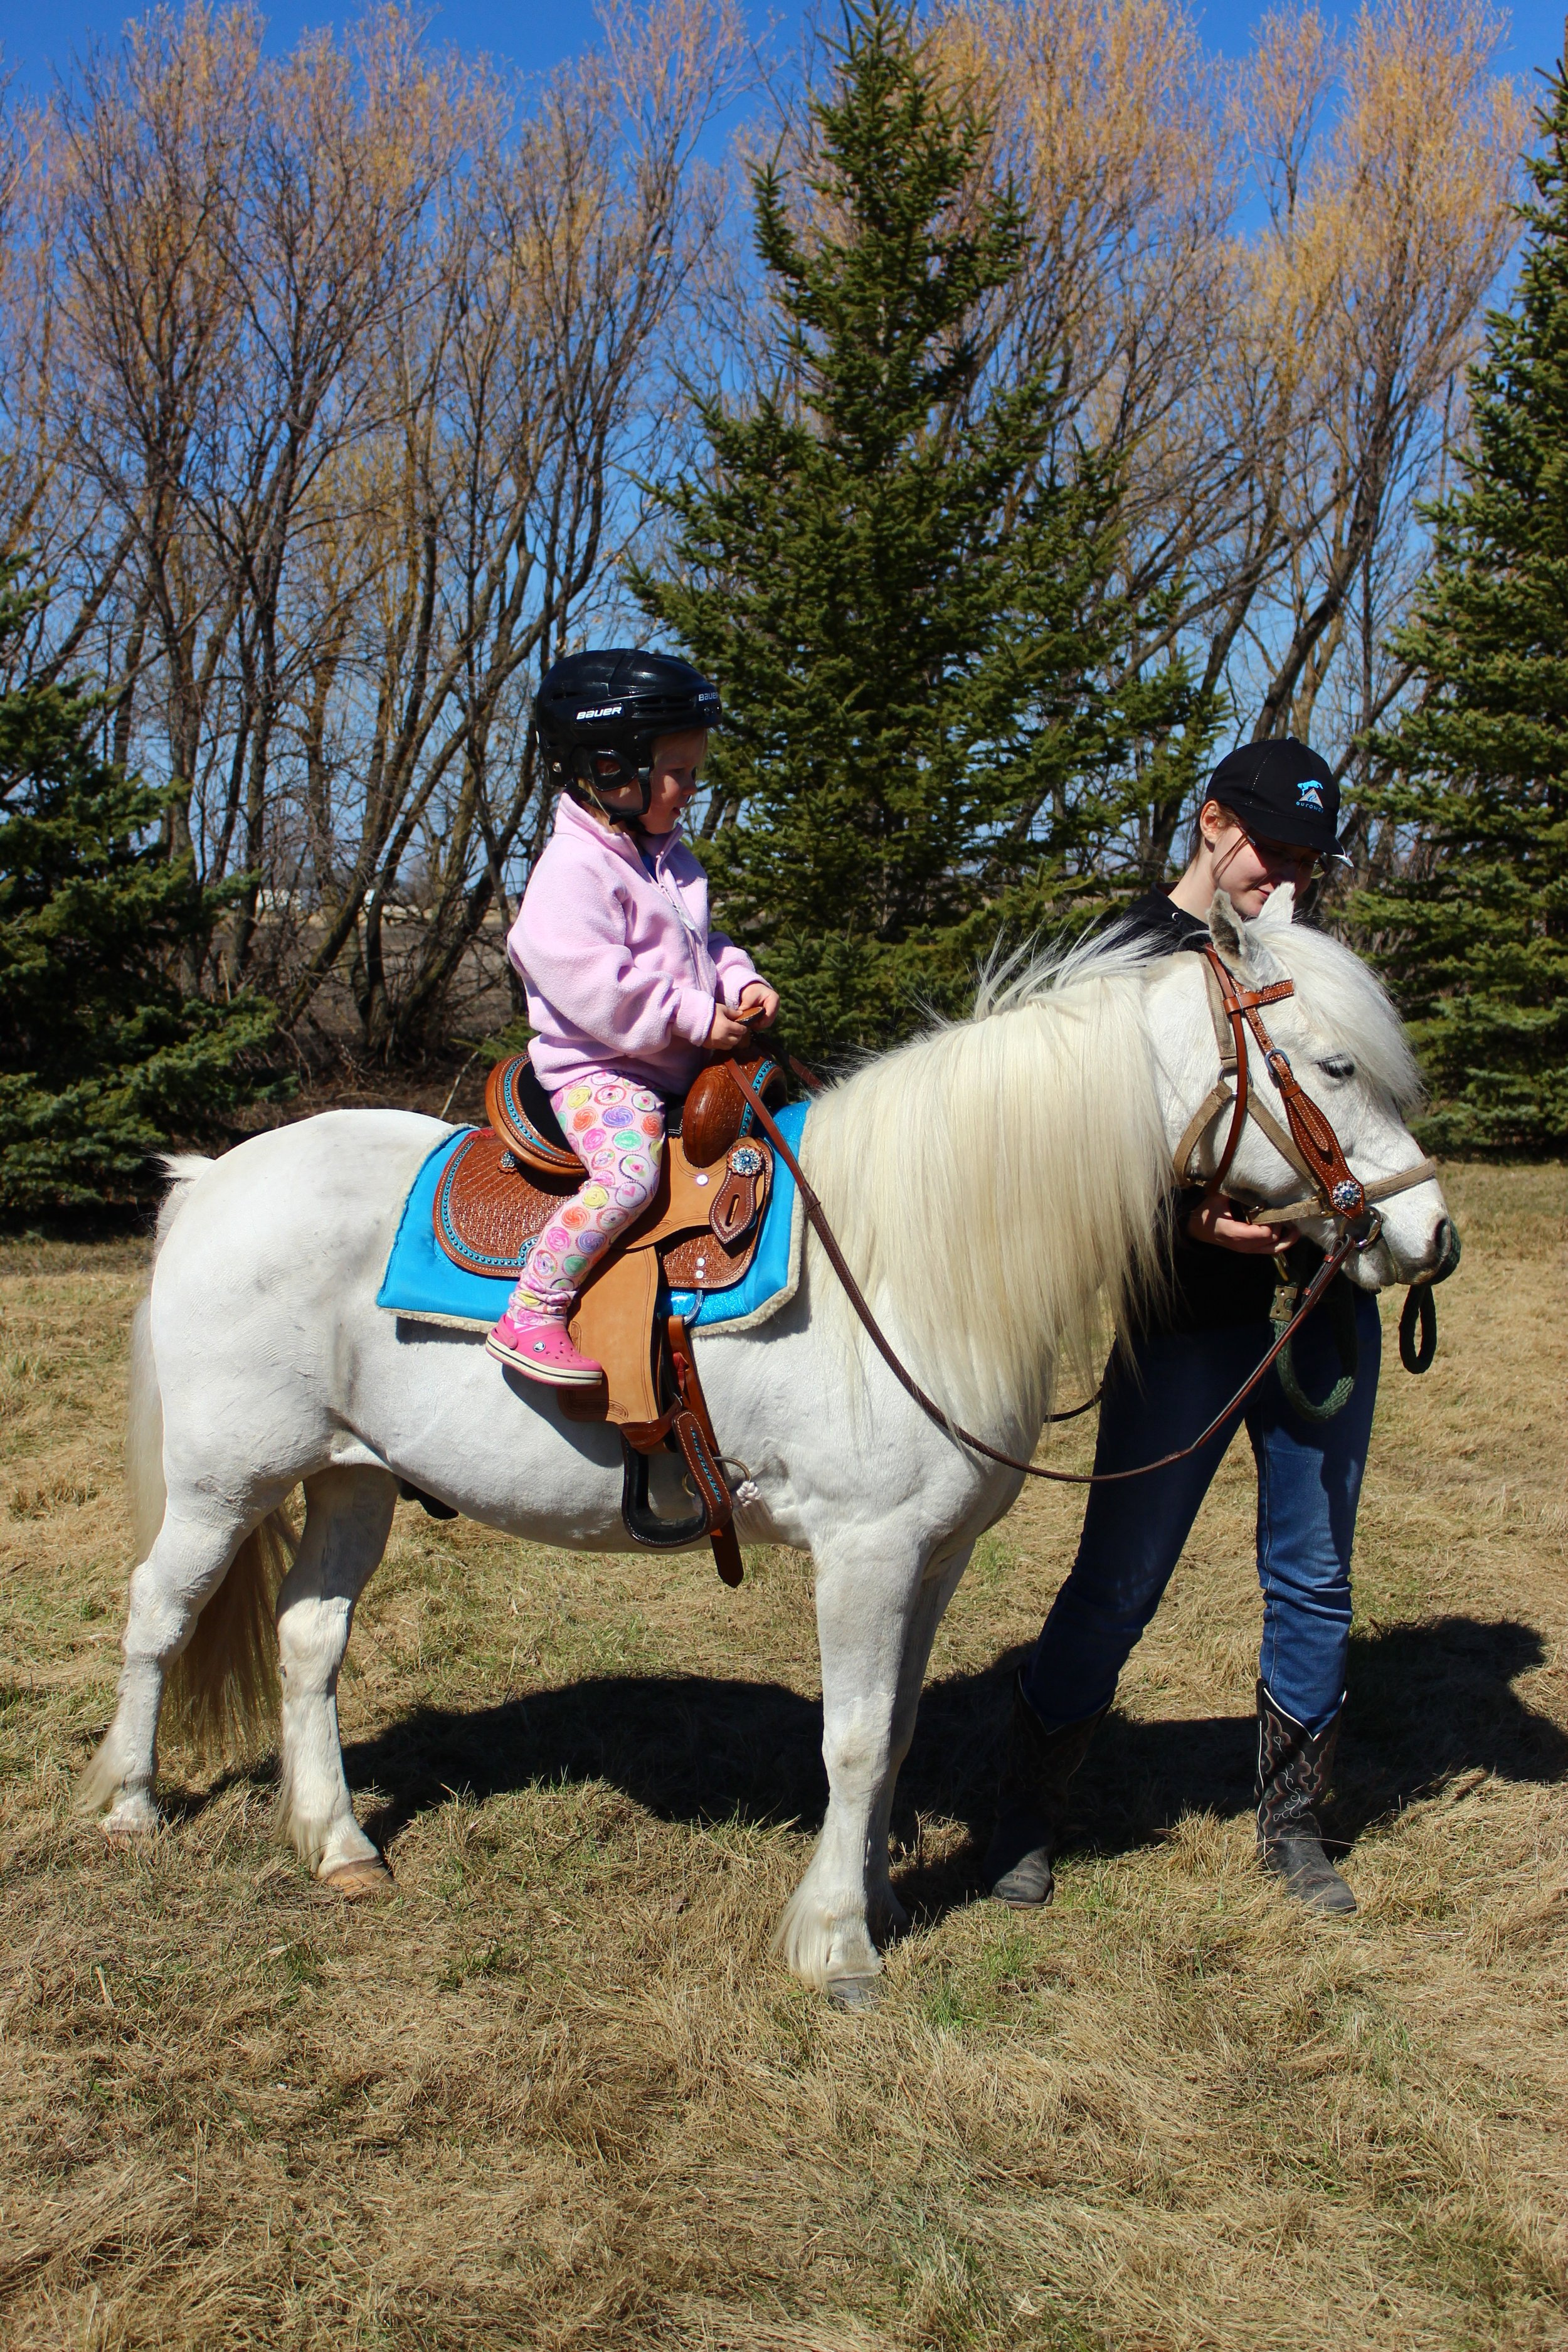 Every Kid Loves Free Pony Rides